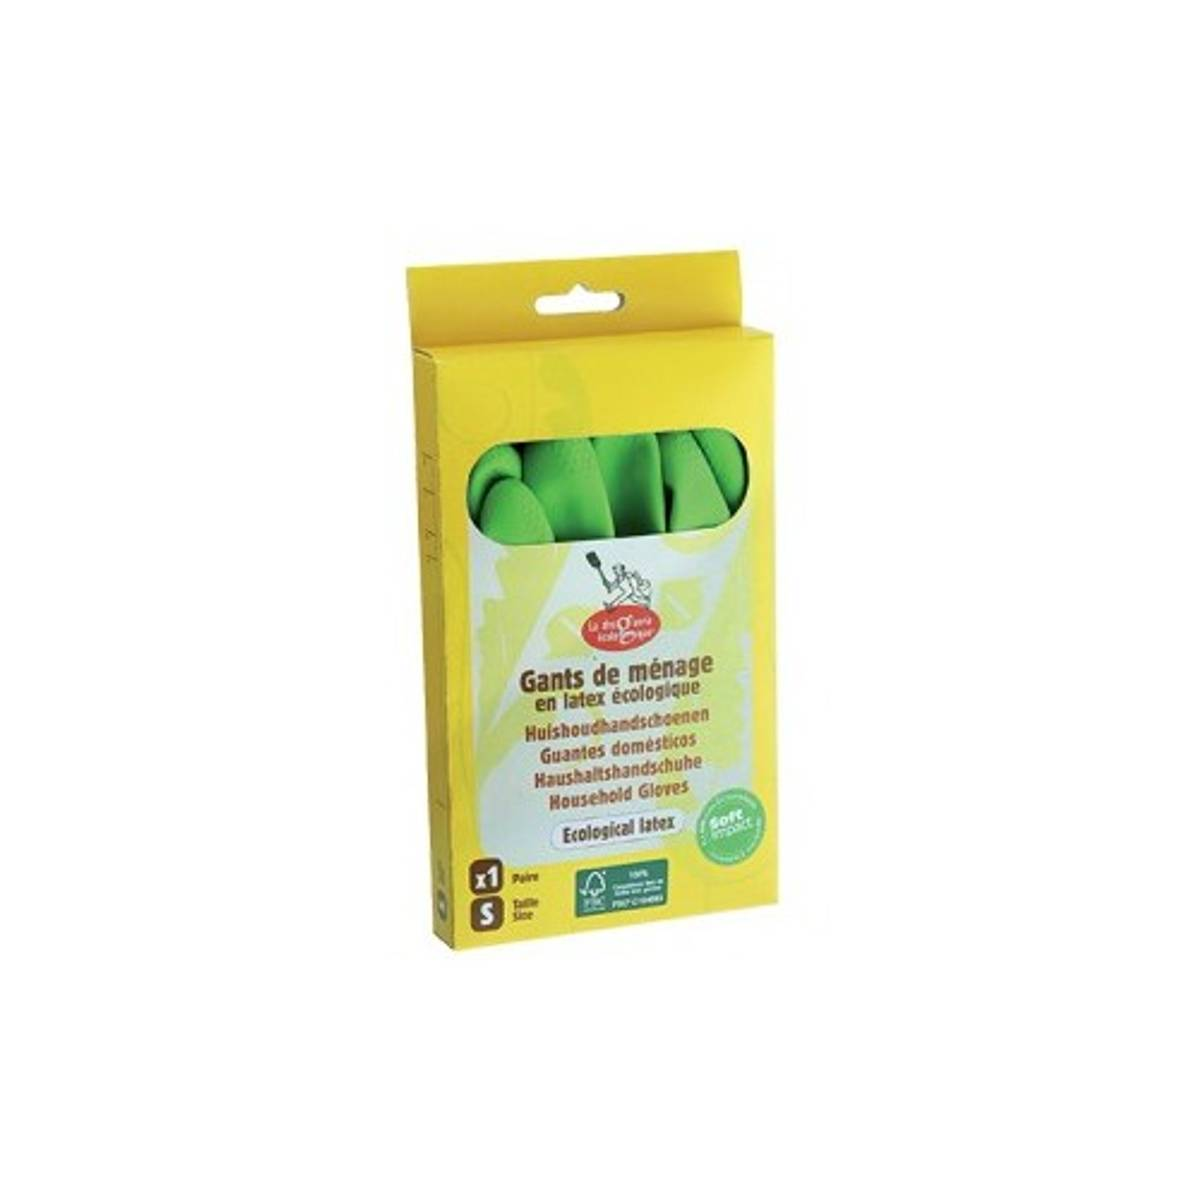 Økologiske gummihansker str. XL / La droguerie écologique®